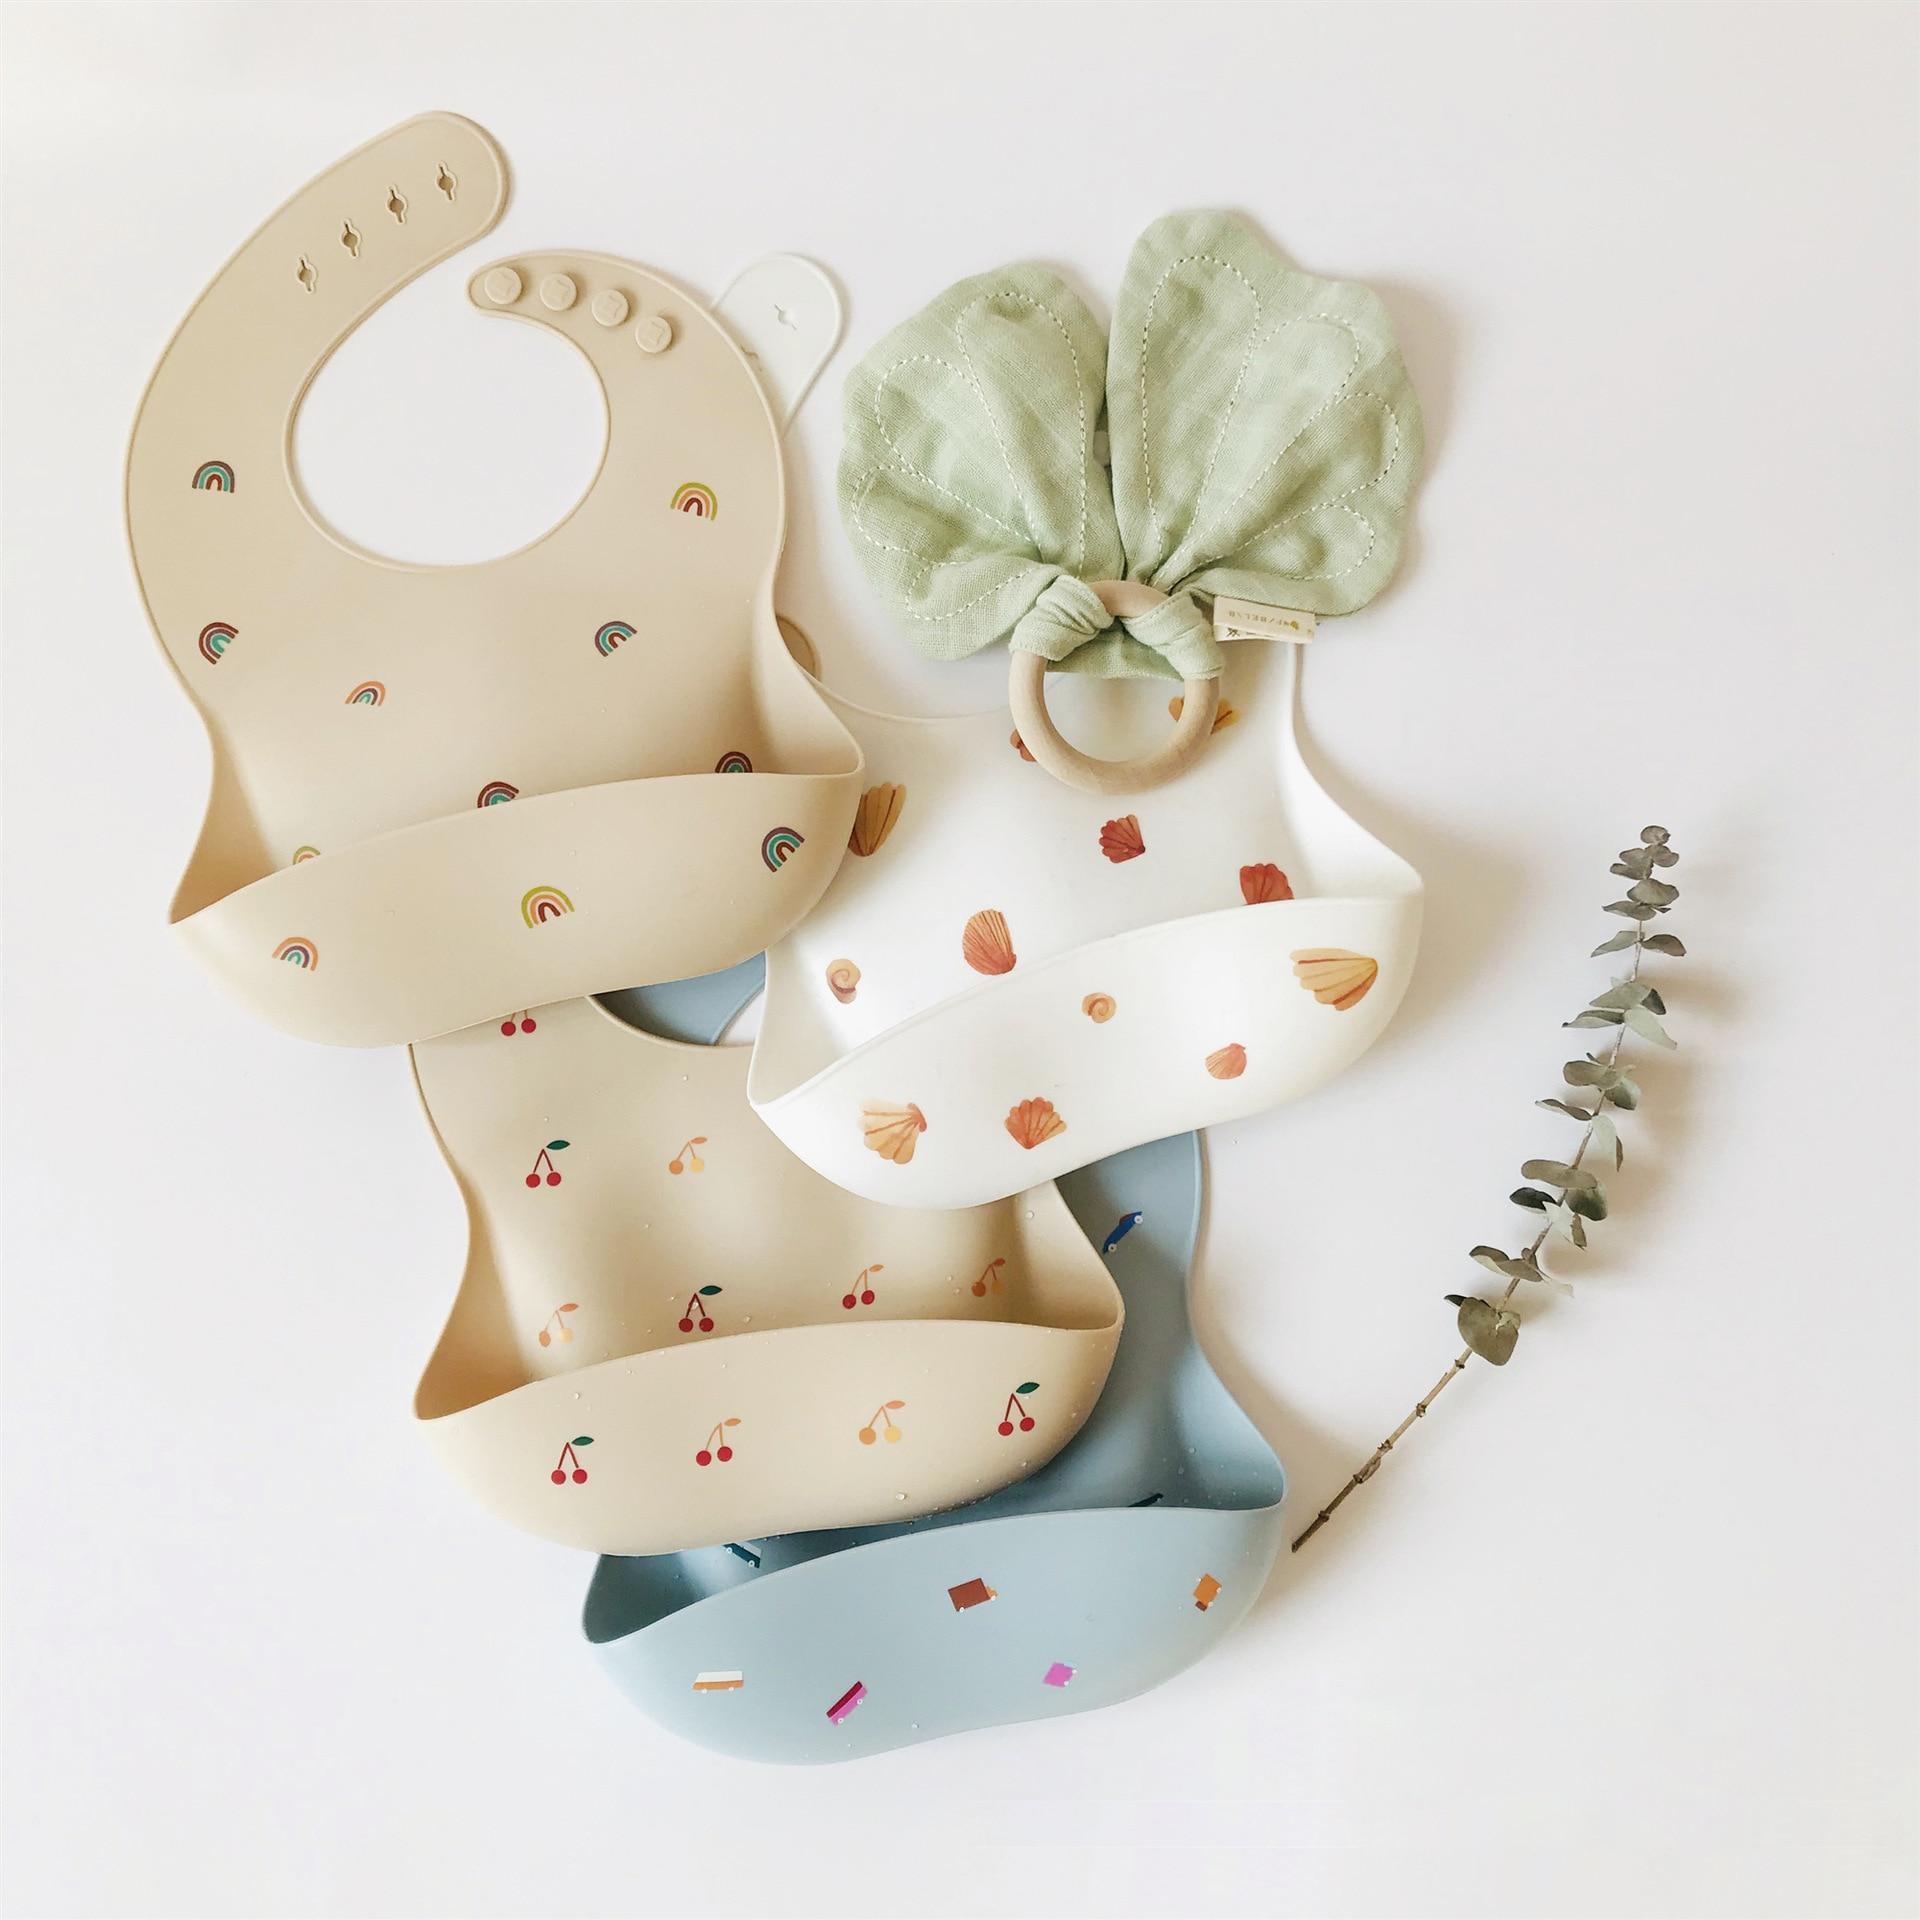 New Baby Bibs Adjustable Cherry Rainbow Print Waterproof  Infant Saliva Dripping Bibs Soft Edible Silicone Towel Dropshipping